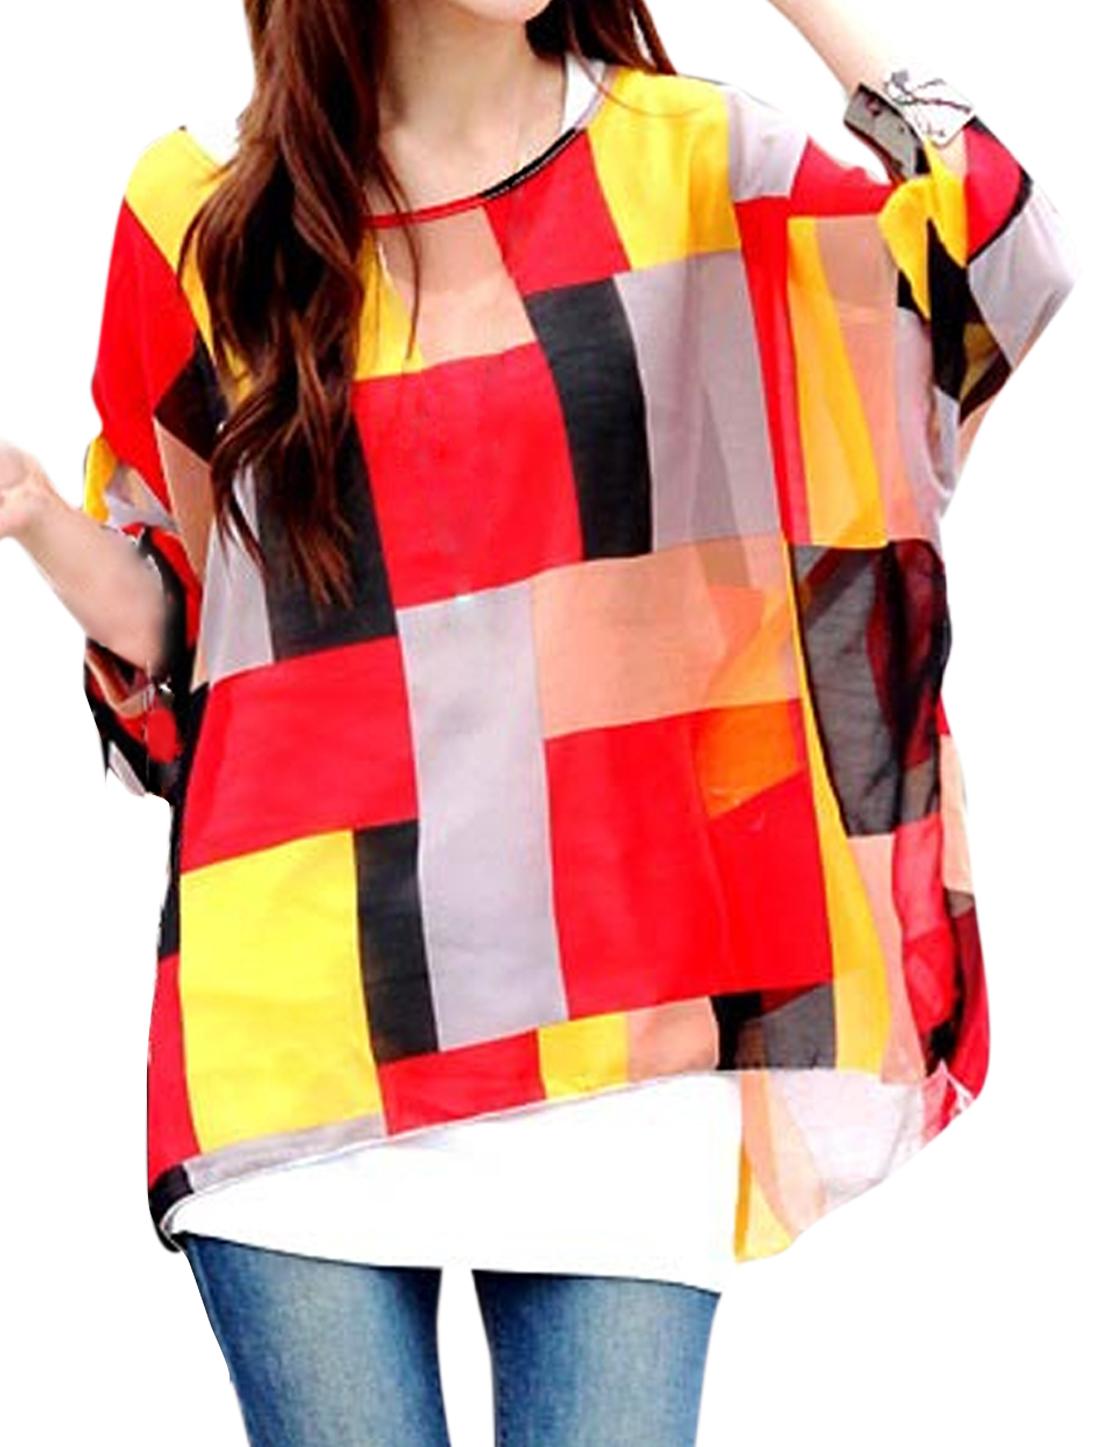 Women 3/4 Sleeve Round Neck Geometric Print High-Low Hem Blouse Red Yellow S